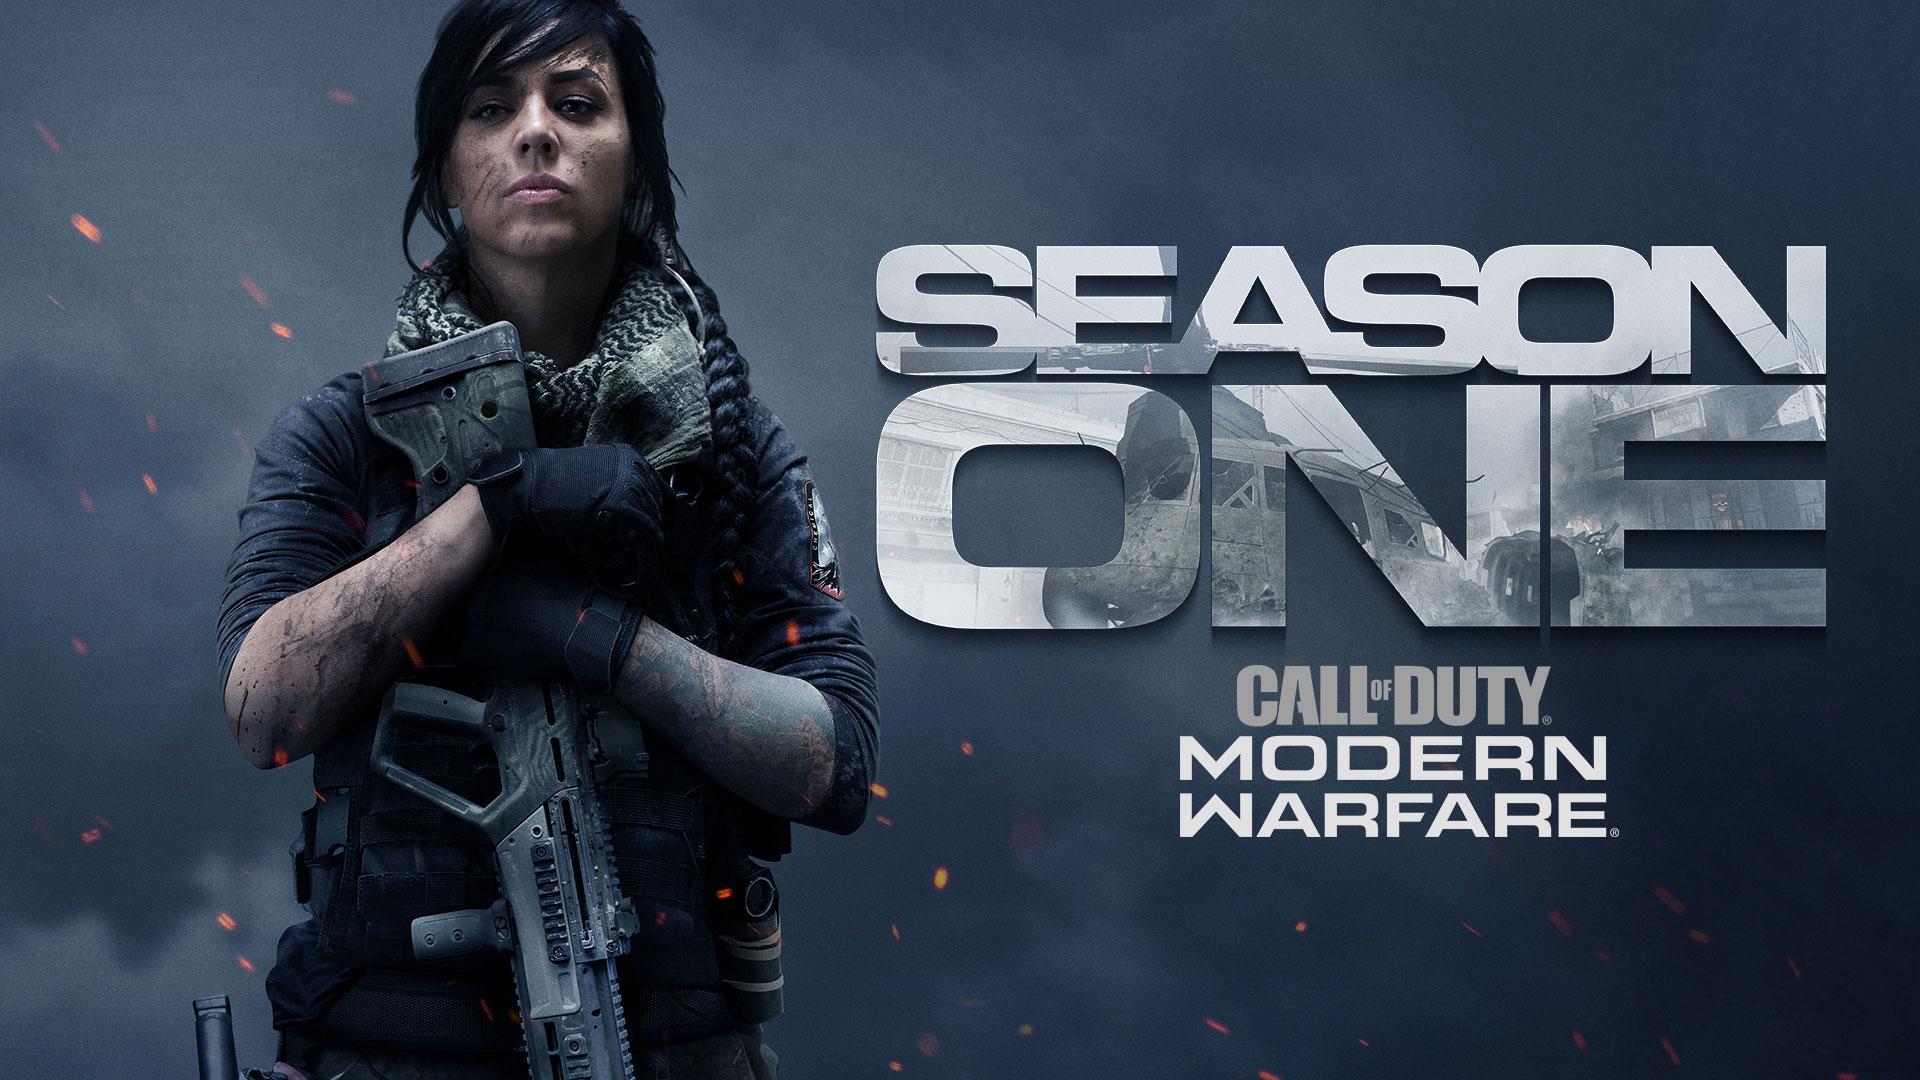 Call Of Duty Modern Warfare Season 1 Brings Great Updates 9to5toys